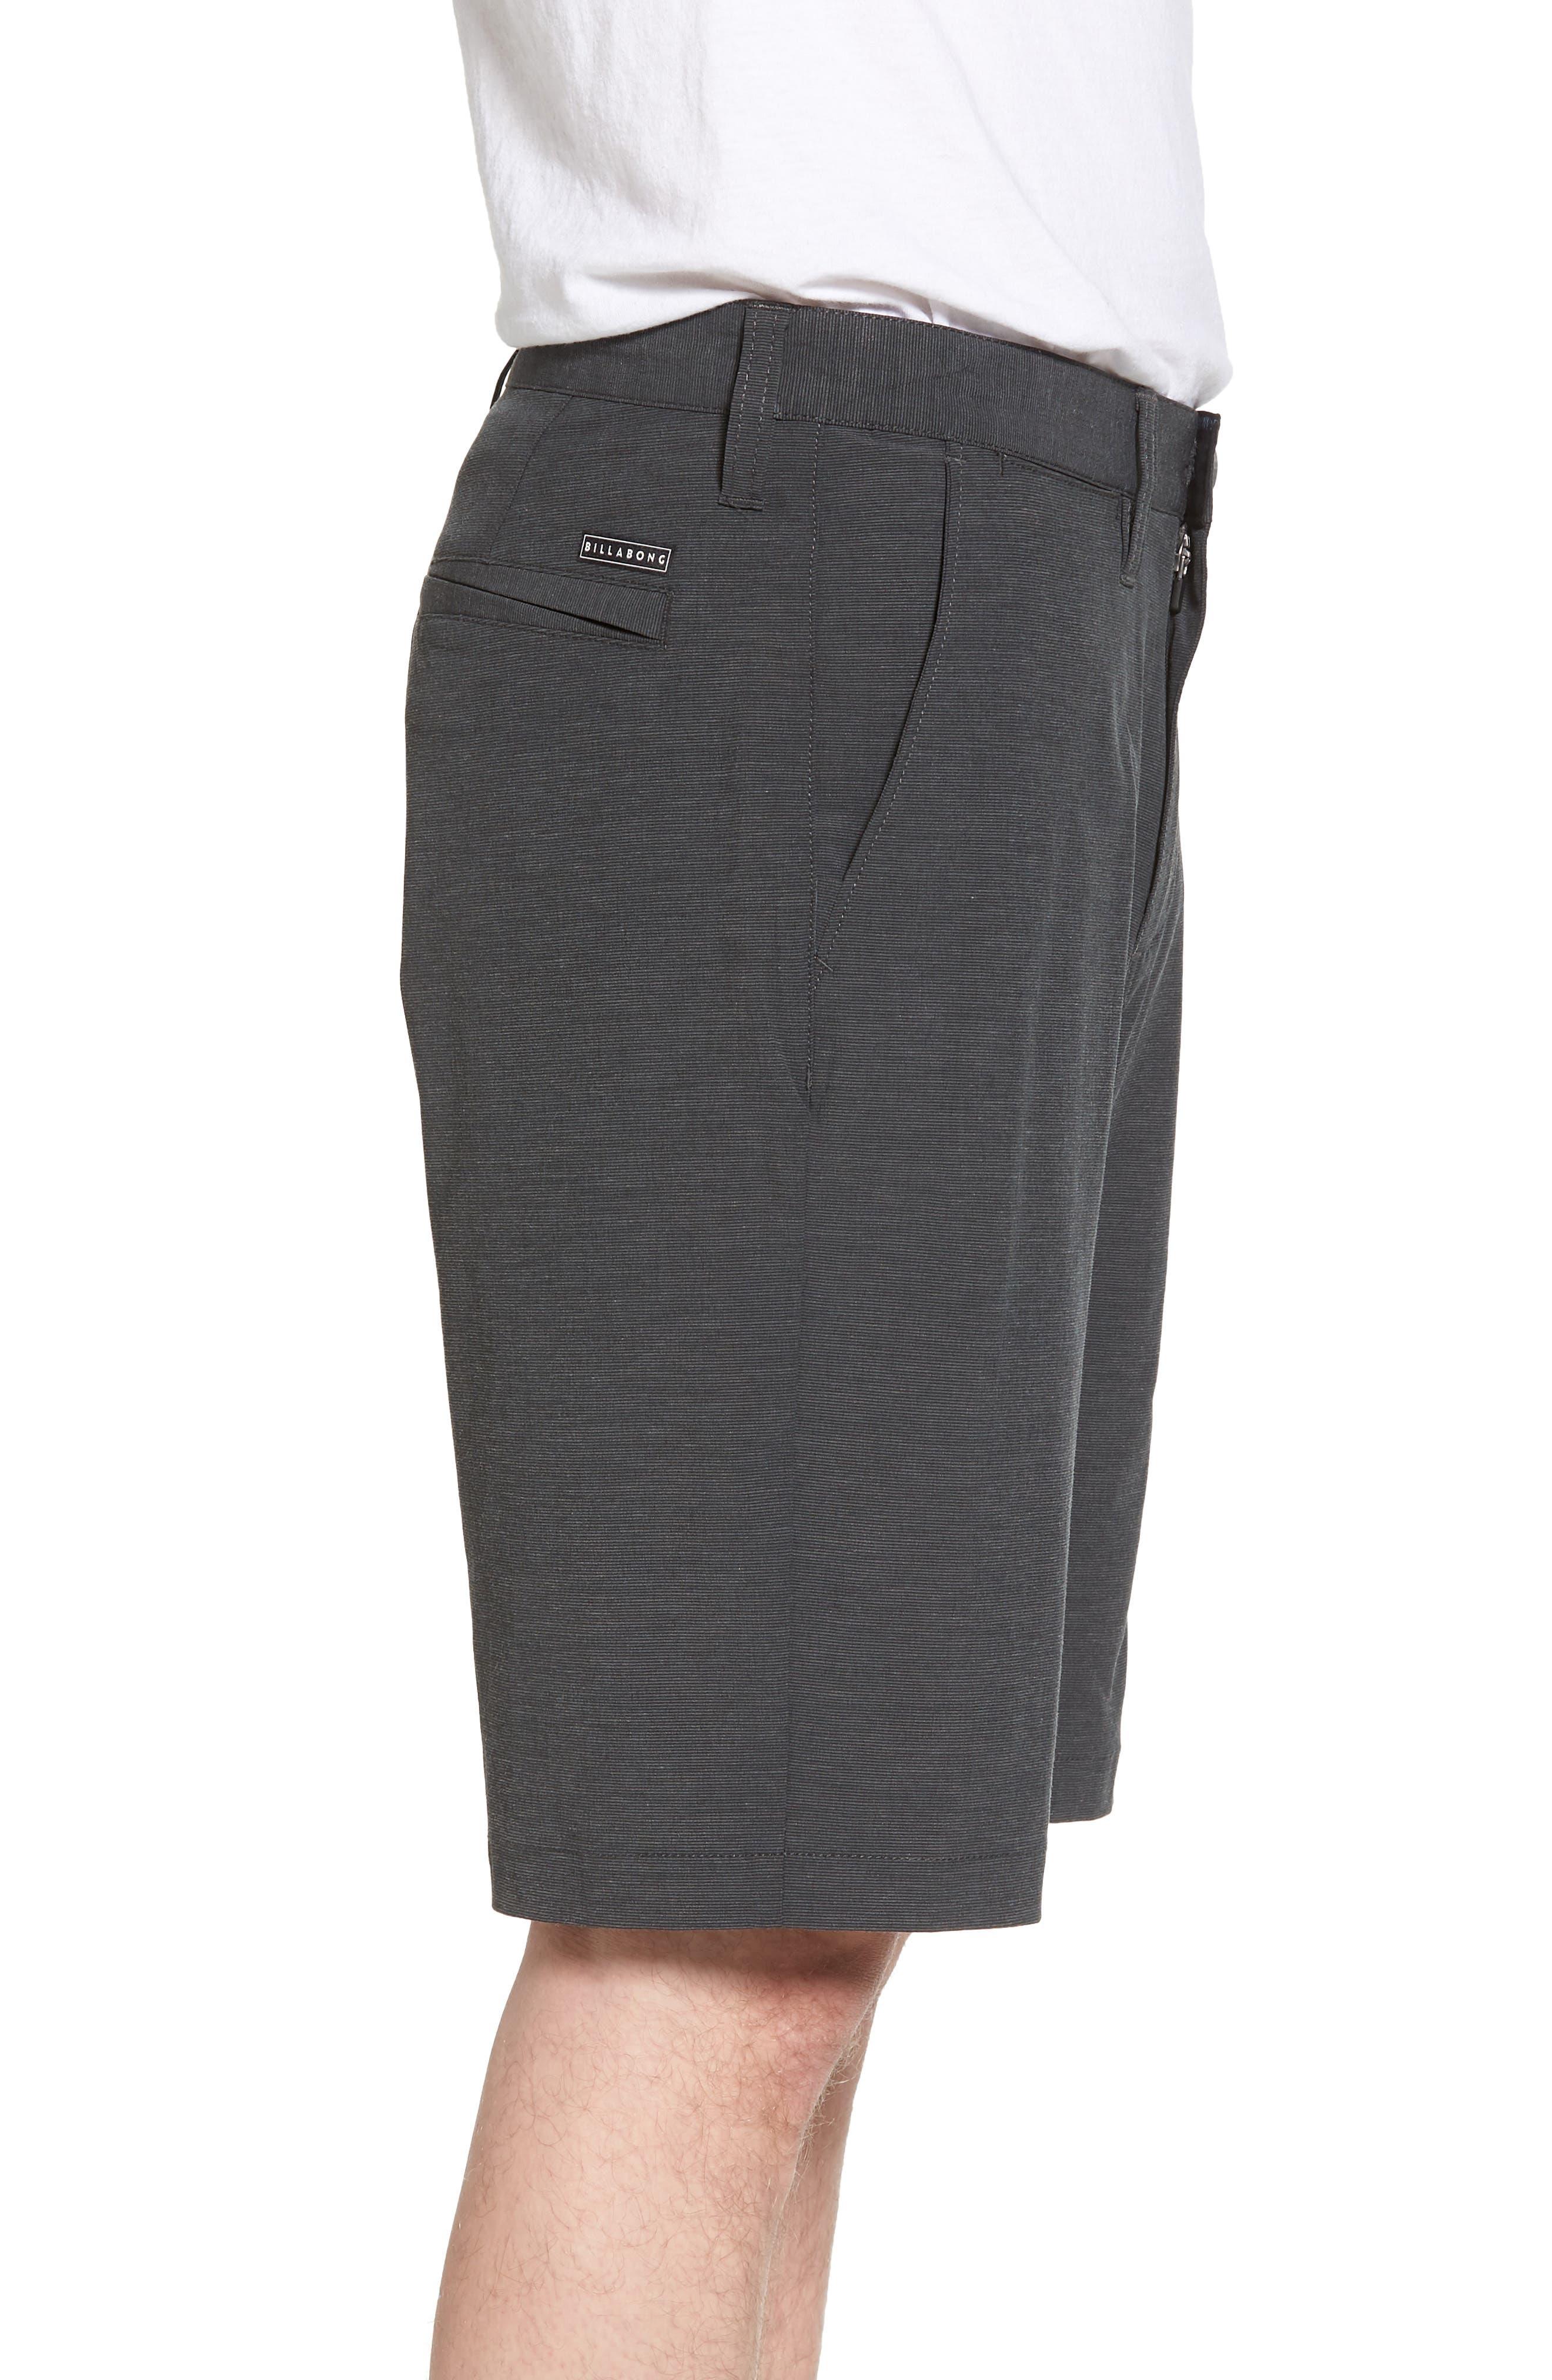 Crossfire X Hybrid Shorts,                             Alternate thumbnail 14, color,